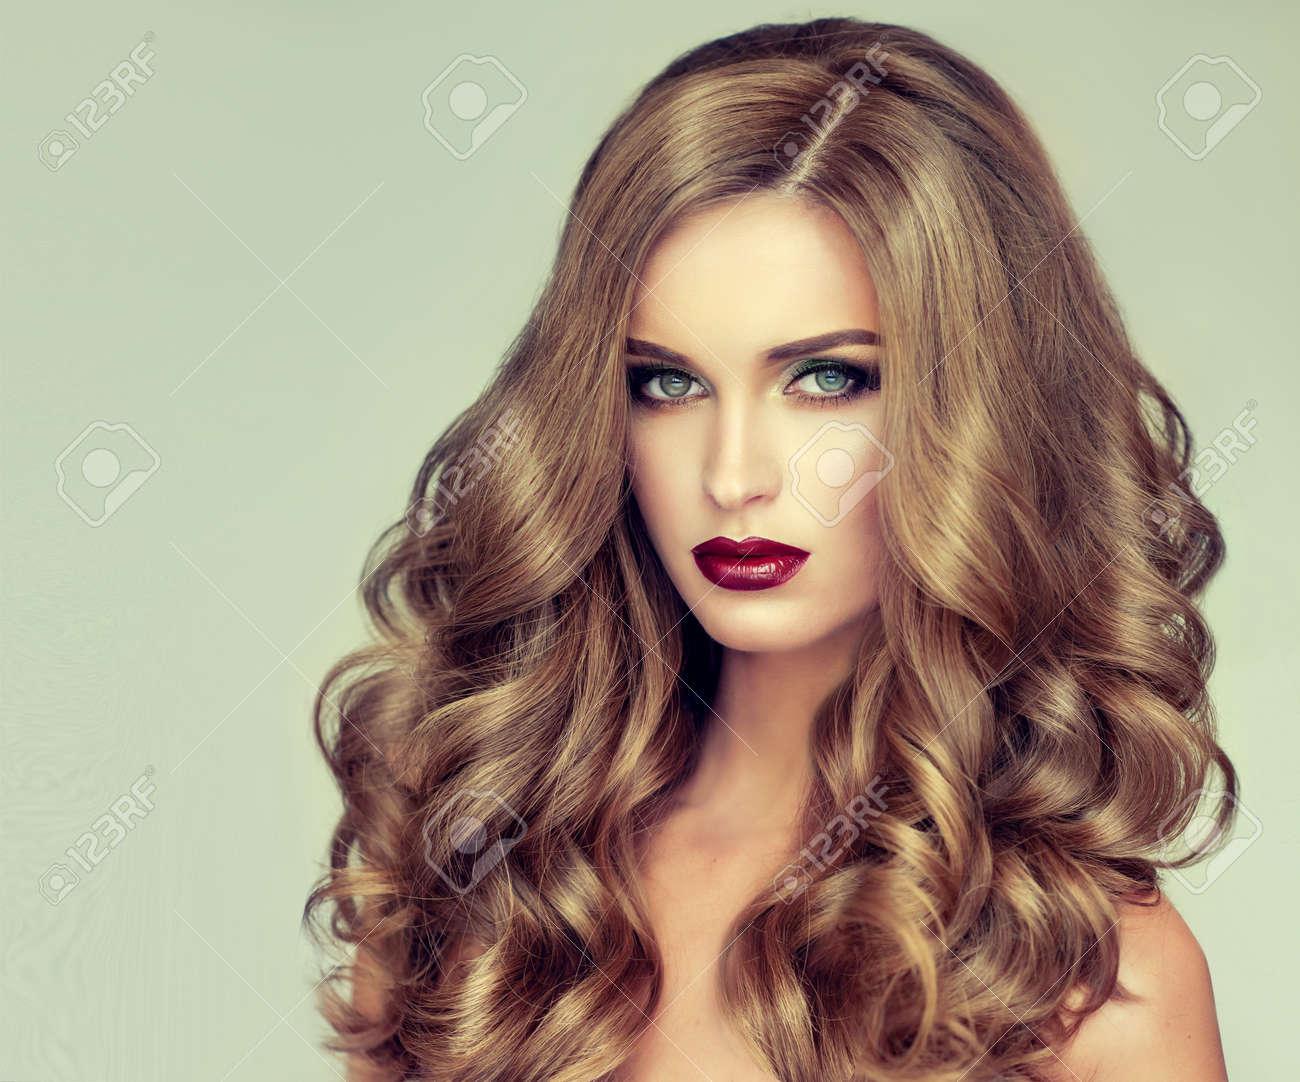 Belle Fille Avec De Longs Cheveux Ondules Blonde Modele Avec